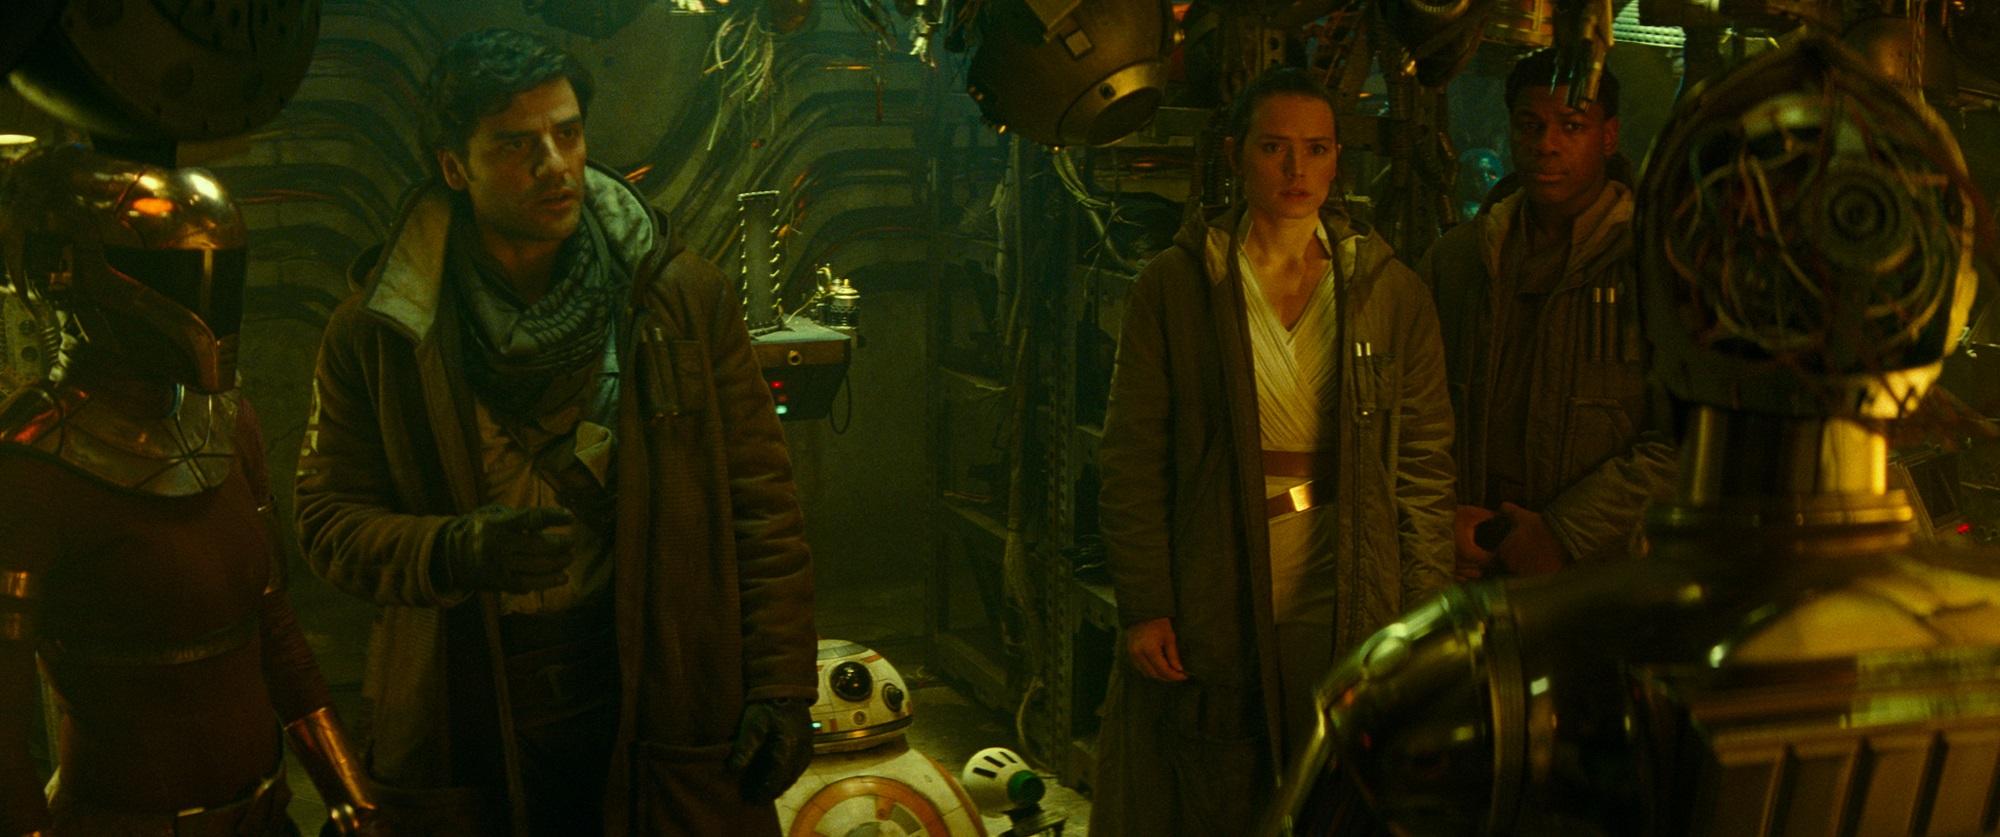 Star Wars (6).jpg